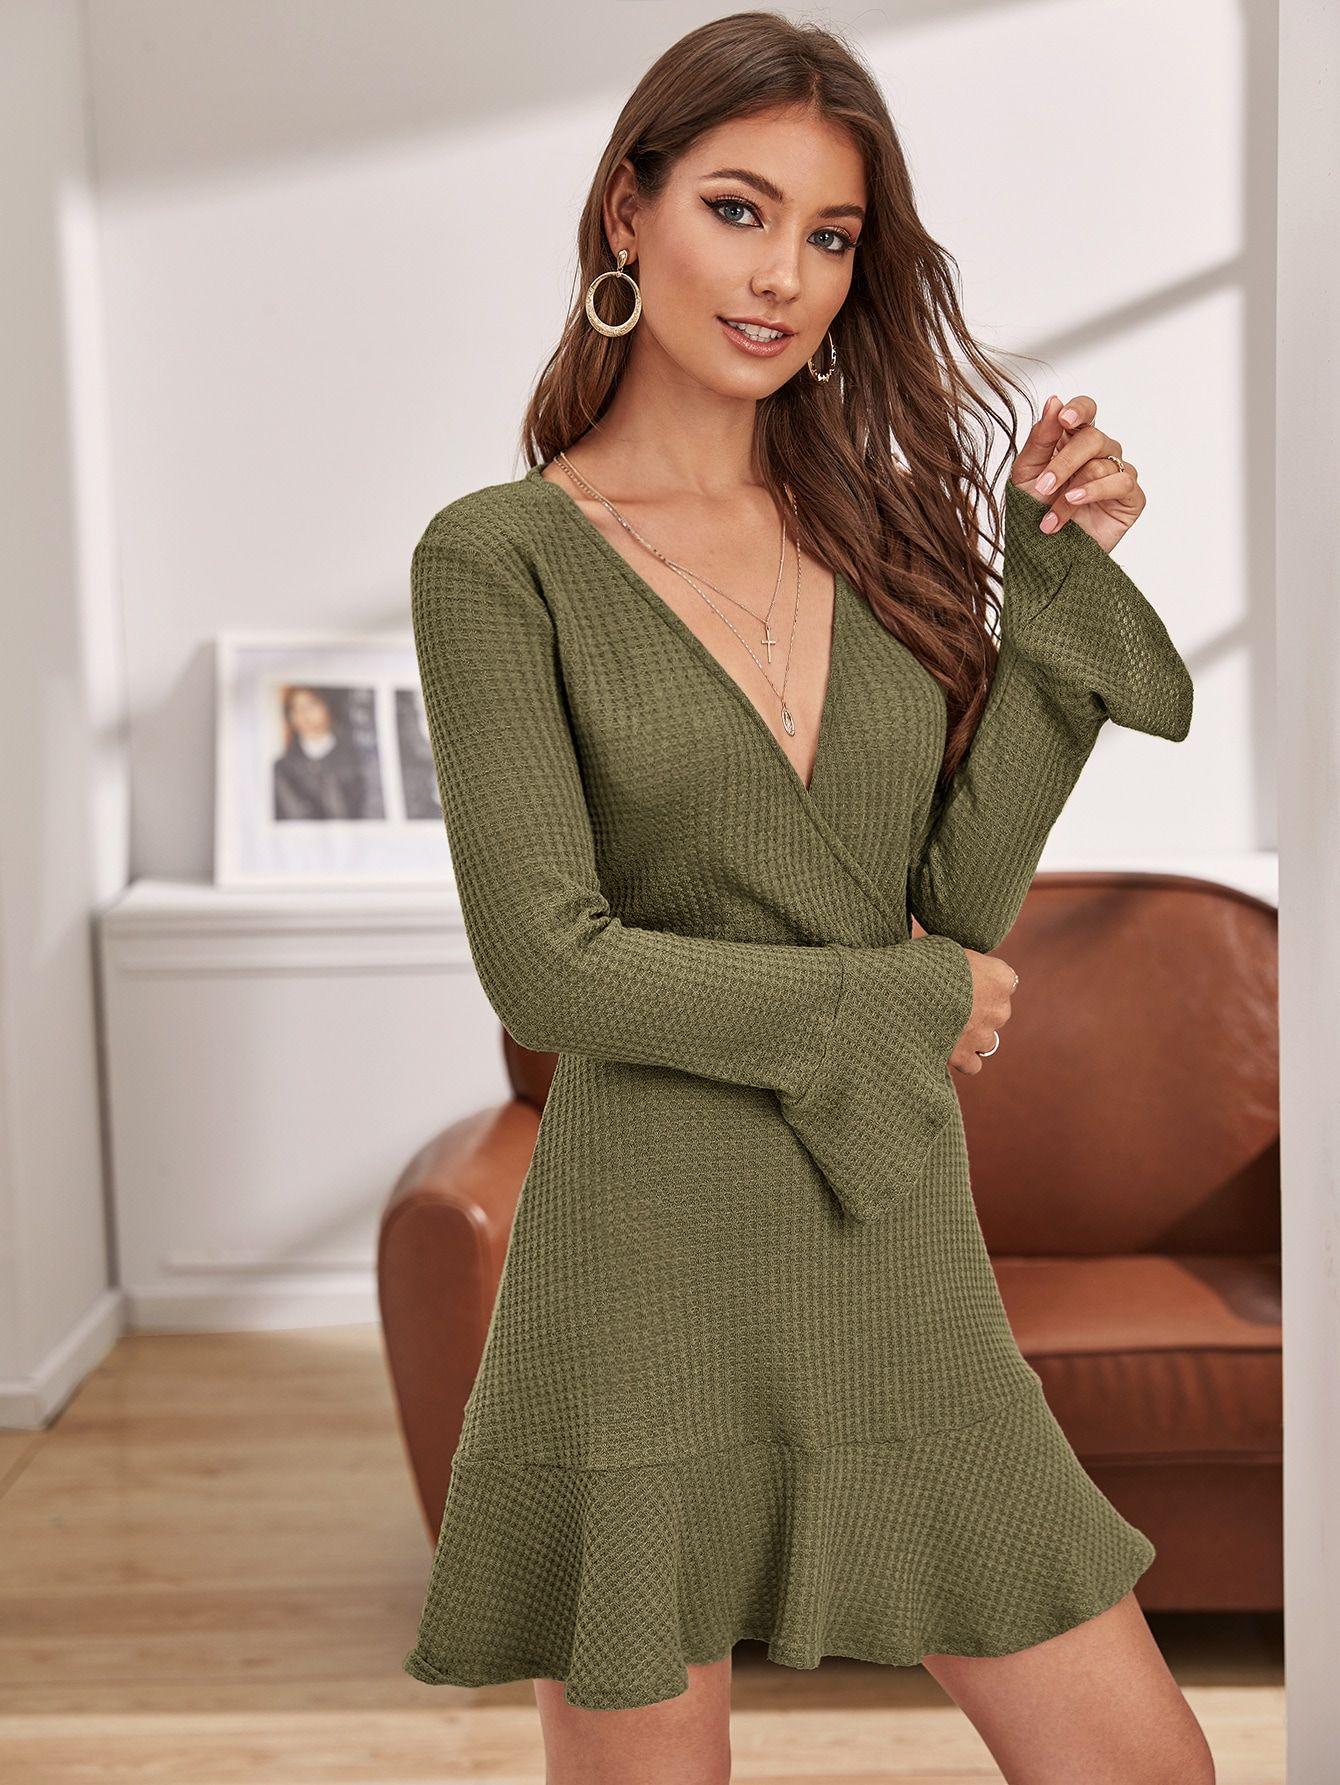 Ad Ruffle Hem Flounce Sleeve Waffle Knit Sweater Dress Tags Elegant Army Green Plain Deep V Neck Mini Ruffle Ruffle Hem Flounce Sleeve Dresses Flounce [ 1785 x 1340 Pixel ]